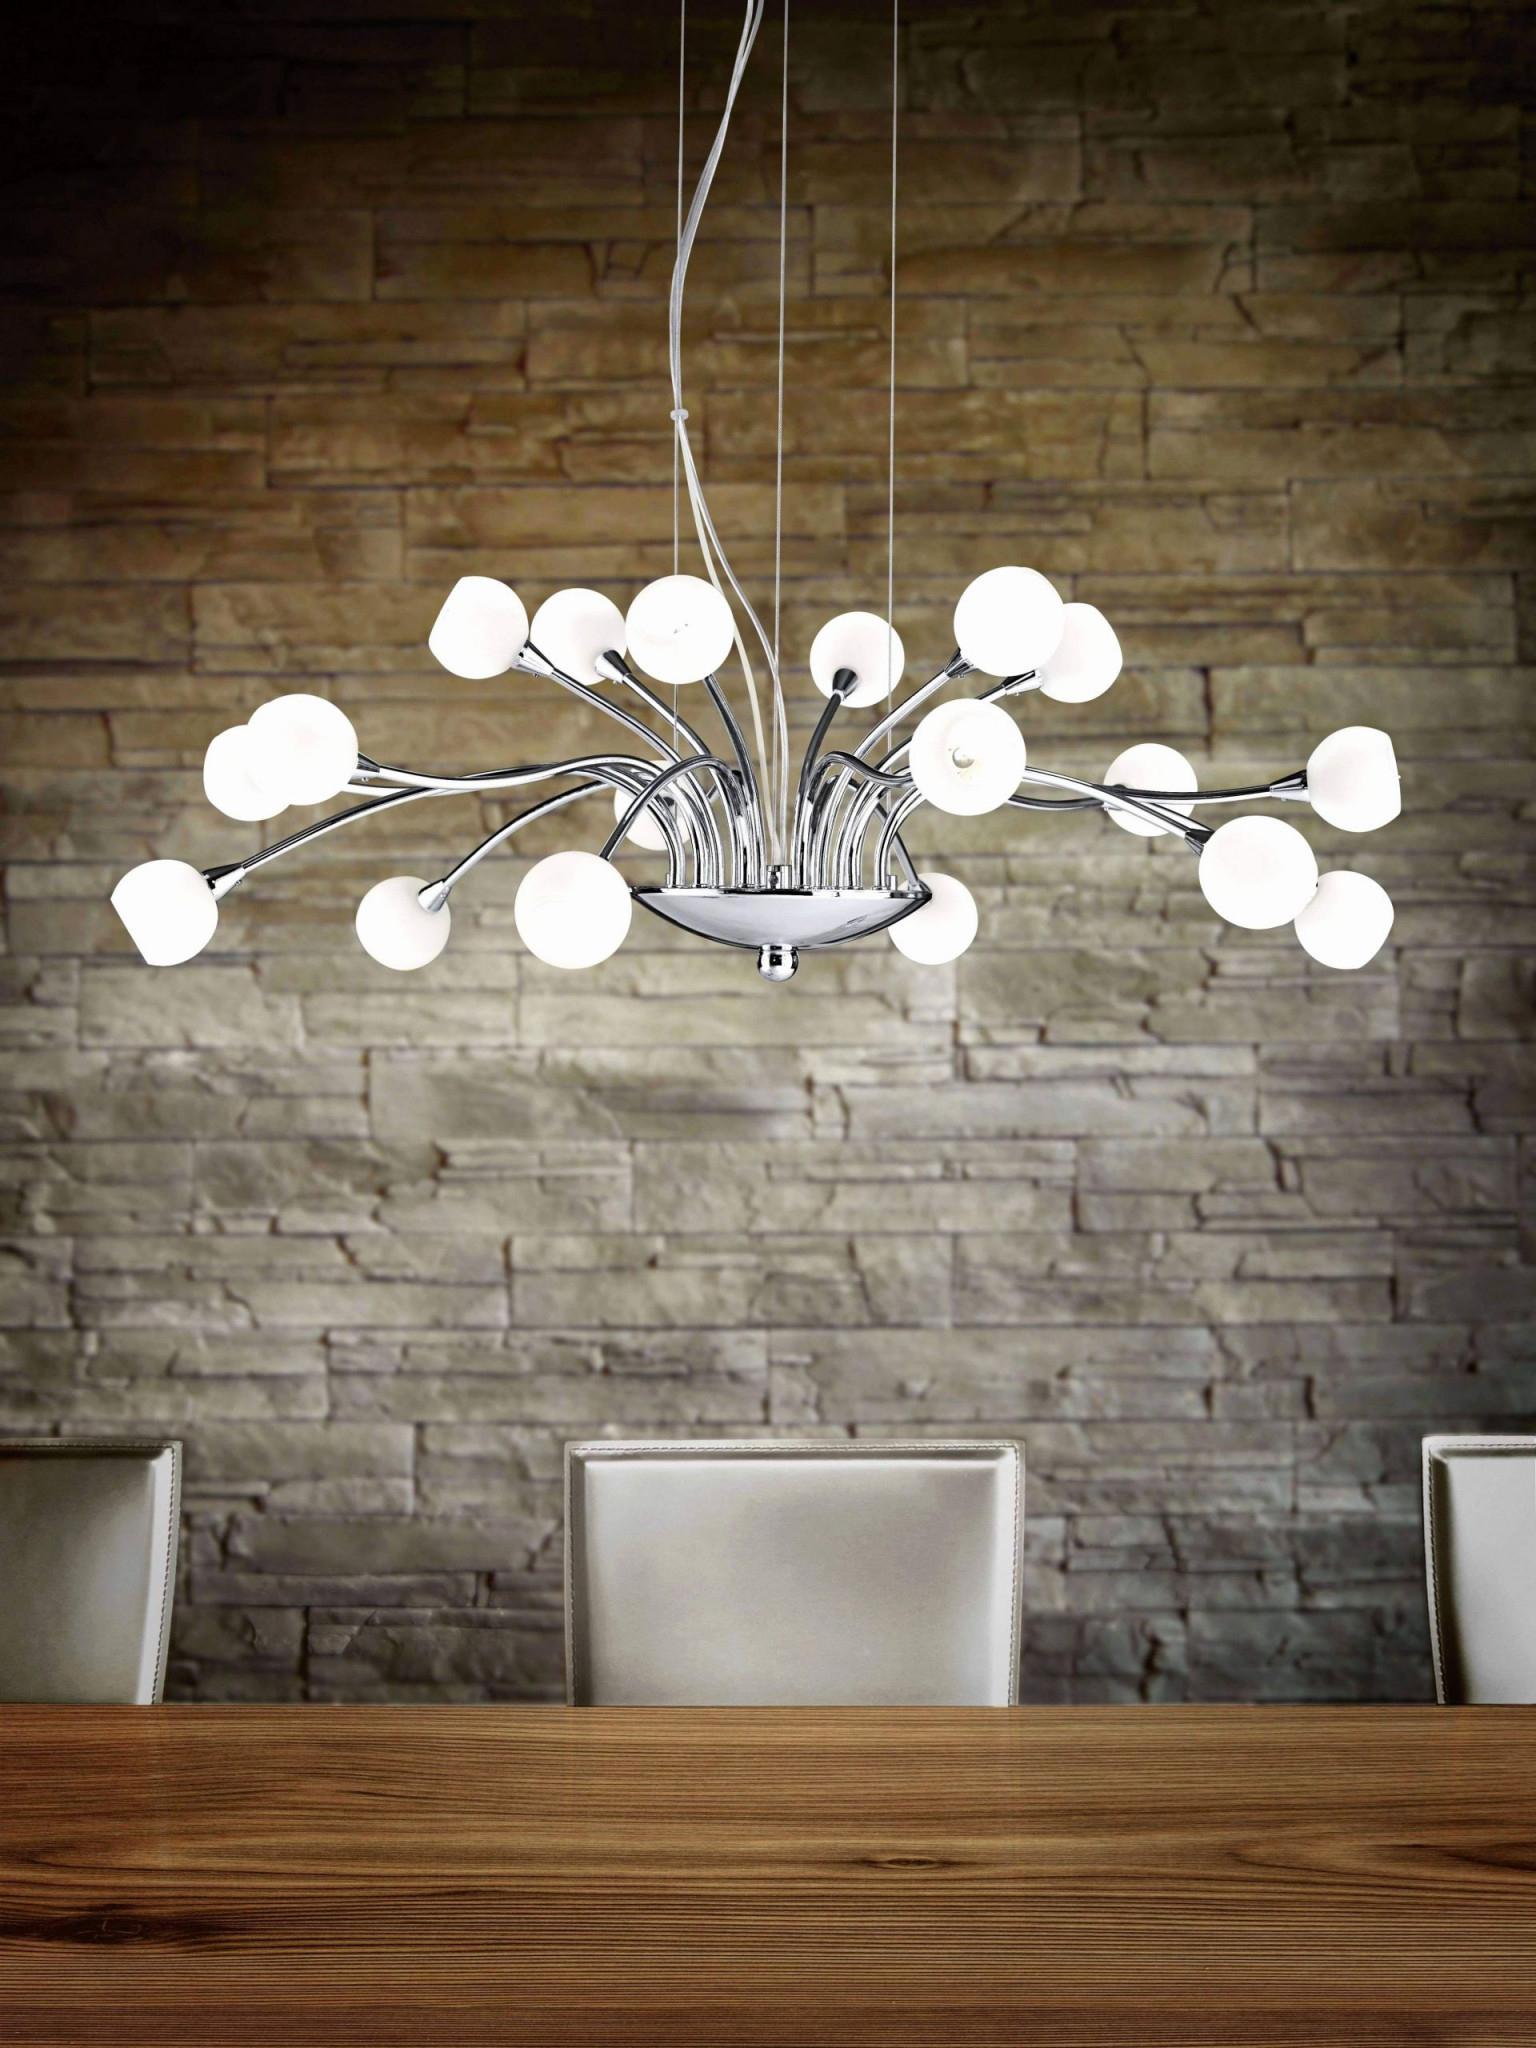 Wohnzimmer Lampe Modern Genial Lampen Wohnzimmer Modern von Wohnzimmer Lampe Industriedesign Bild